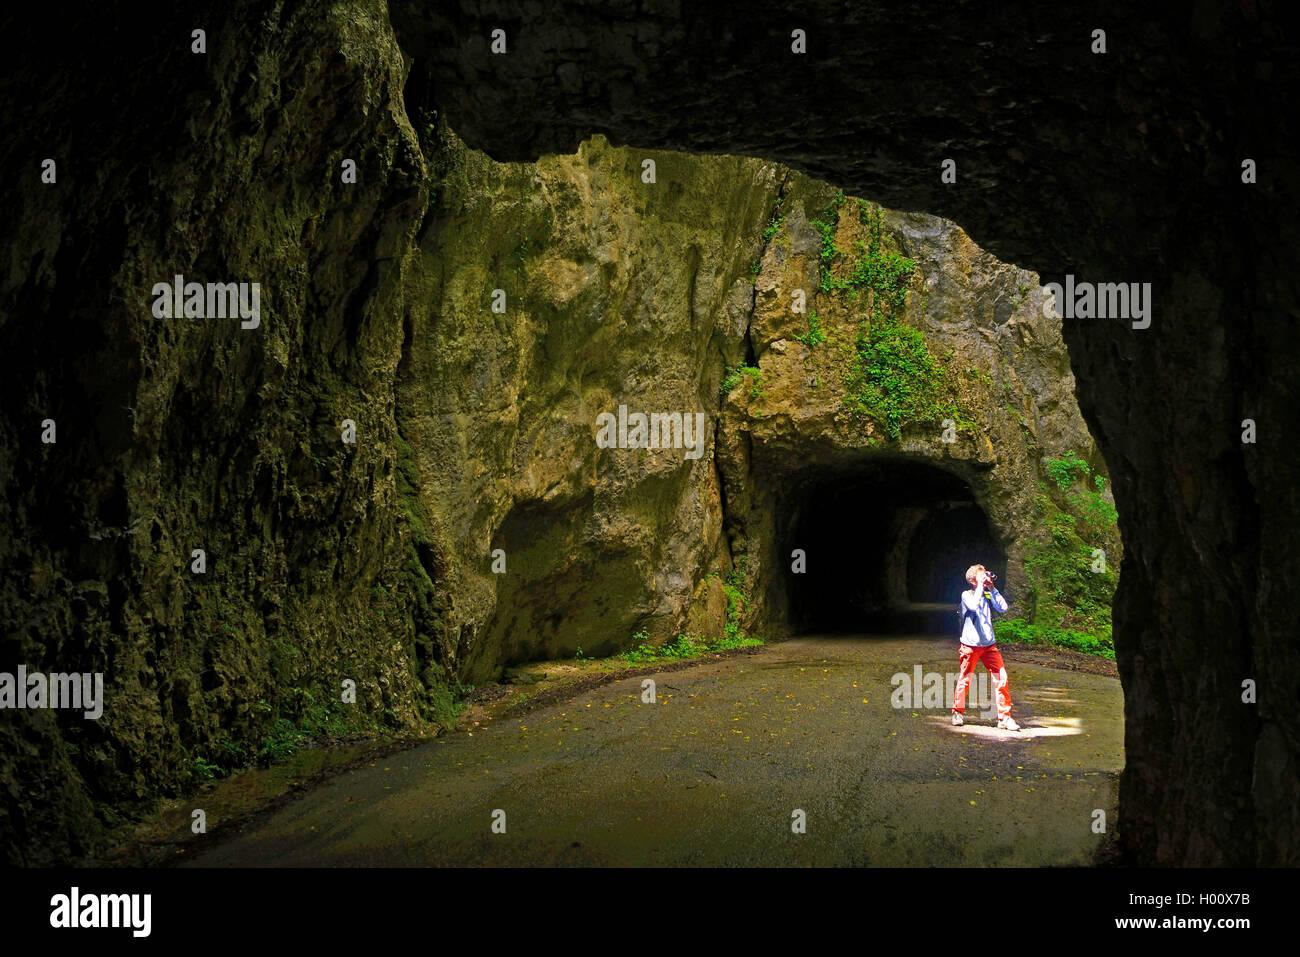 Carretera de montaña con túneles gorge Grands Goulet, Francia, Auvergne-Rh¶ne-Alpes, Parque Nacional de Vercors, Pont en Royans Foto de stock